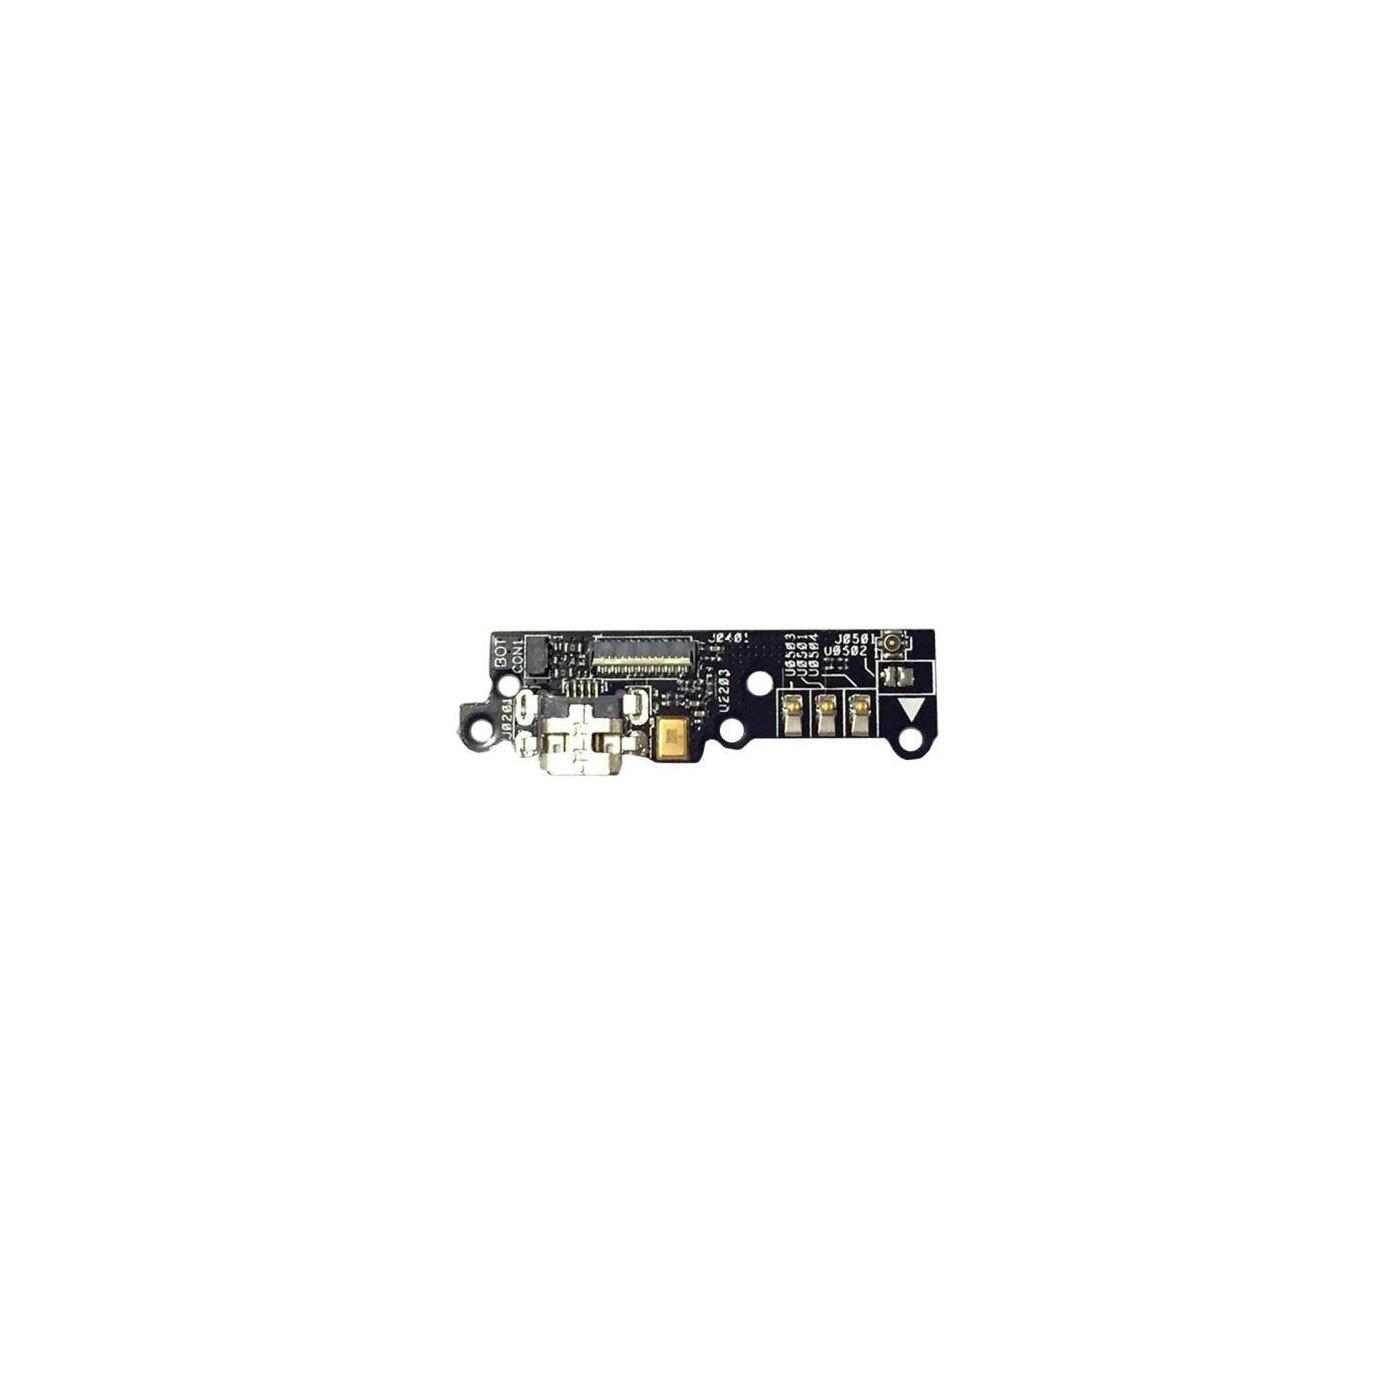 Flat flex connettore di ricarica per Asus Zenfone 6 dock carica dati ricambio